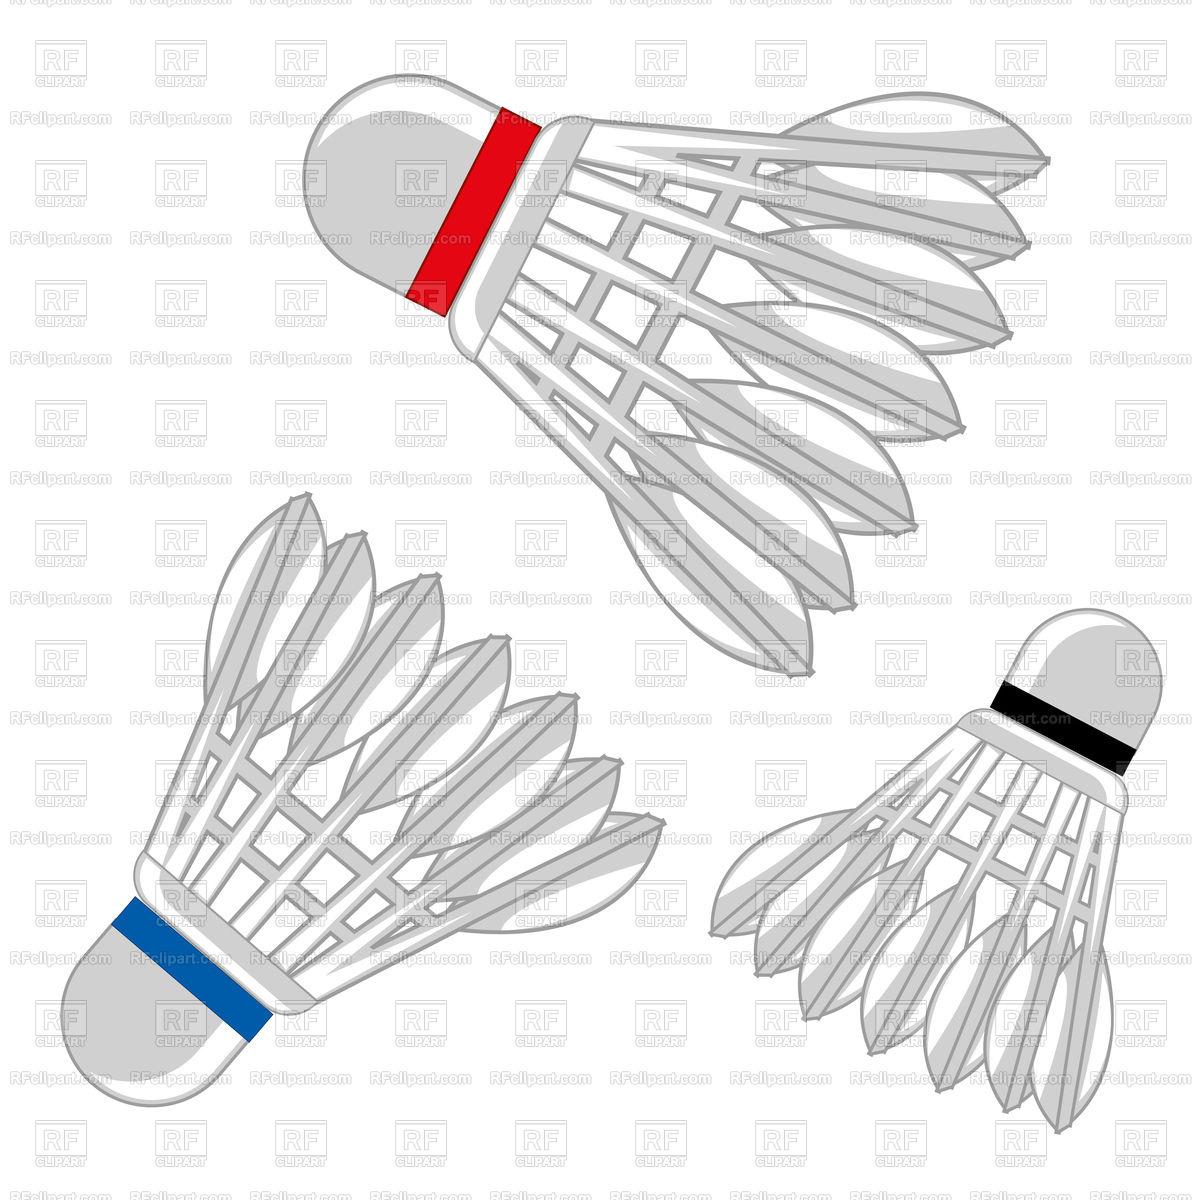 1200x1200 Shuttlecock For Game Of Badminton Illustration Vector Image